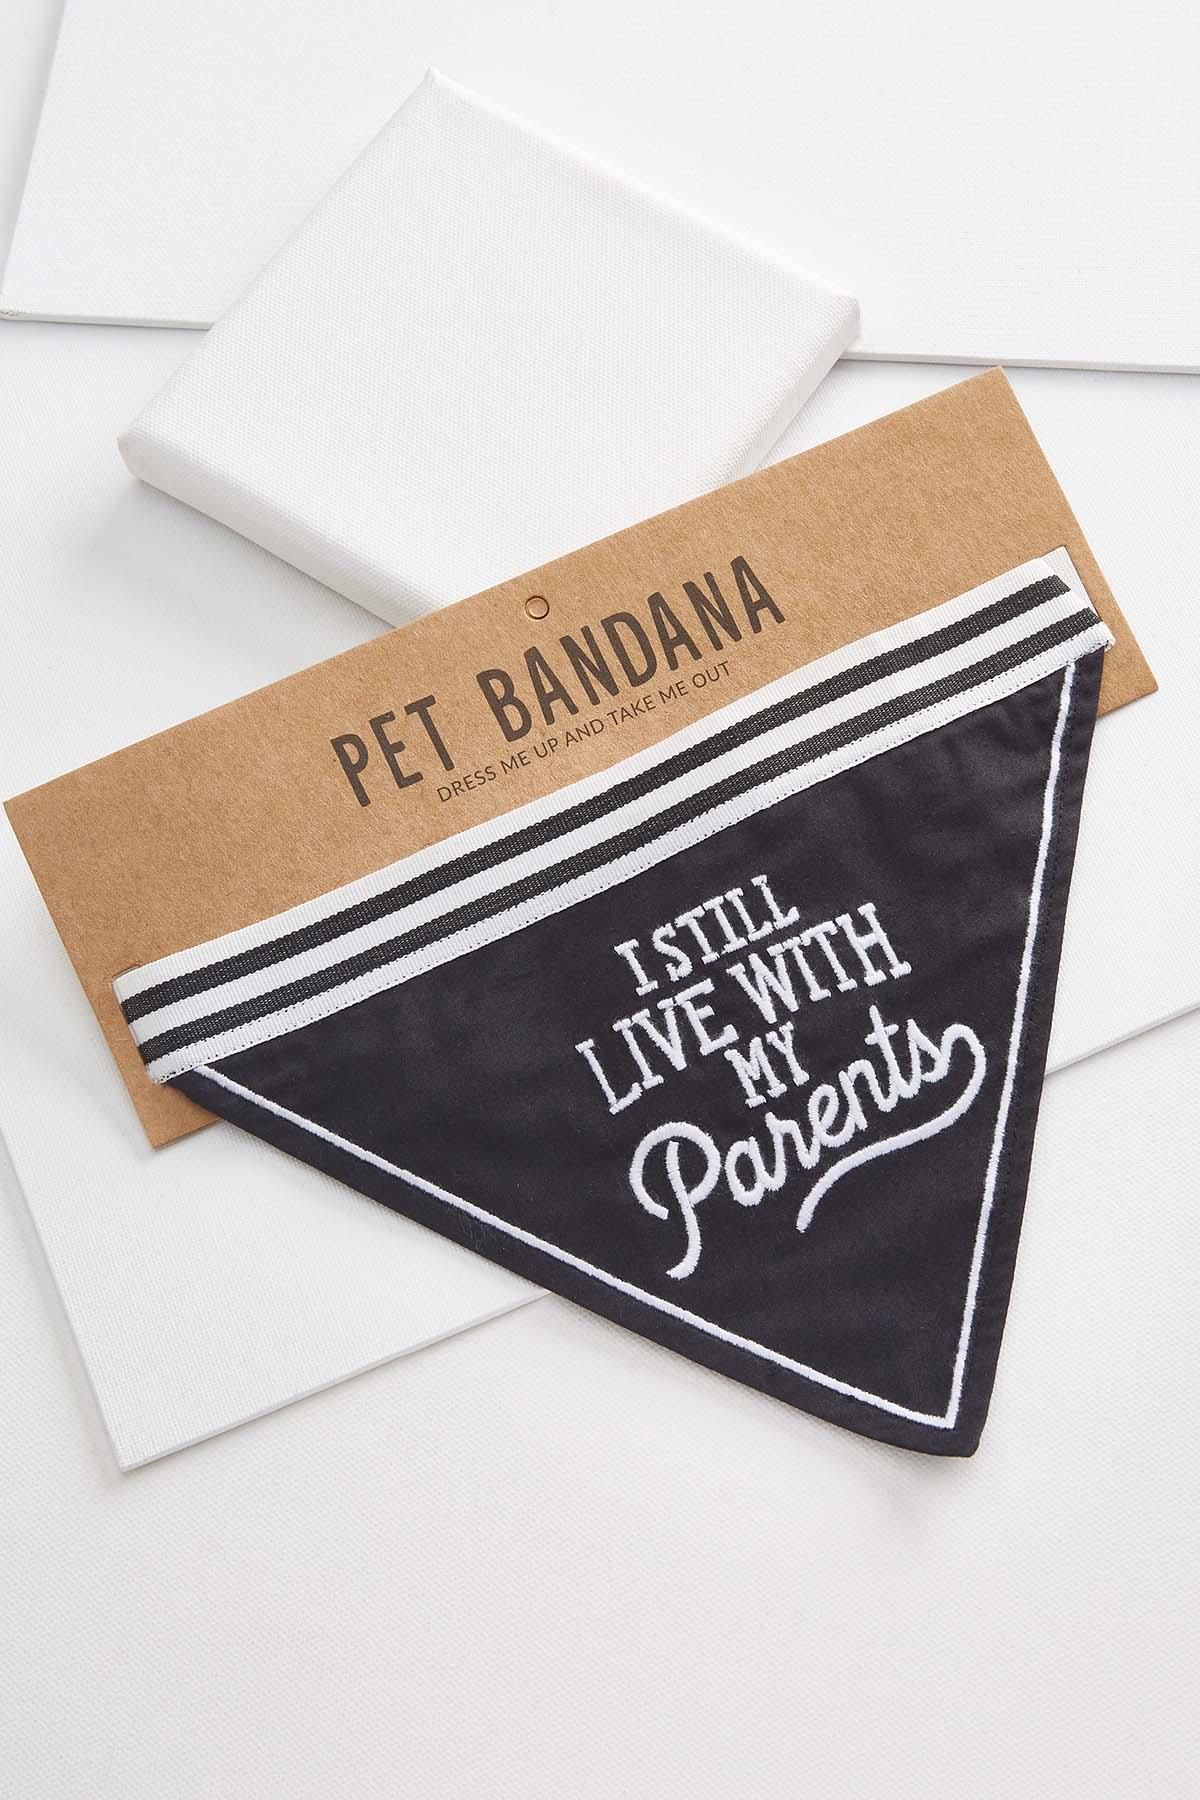 Still Live With My Parents Pet Bandana